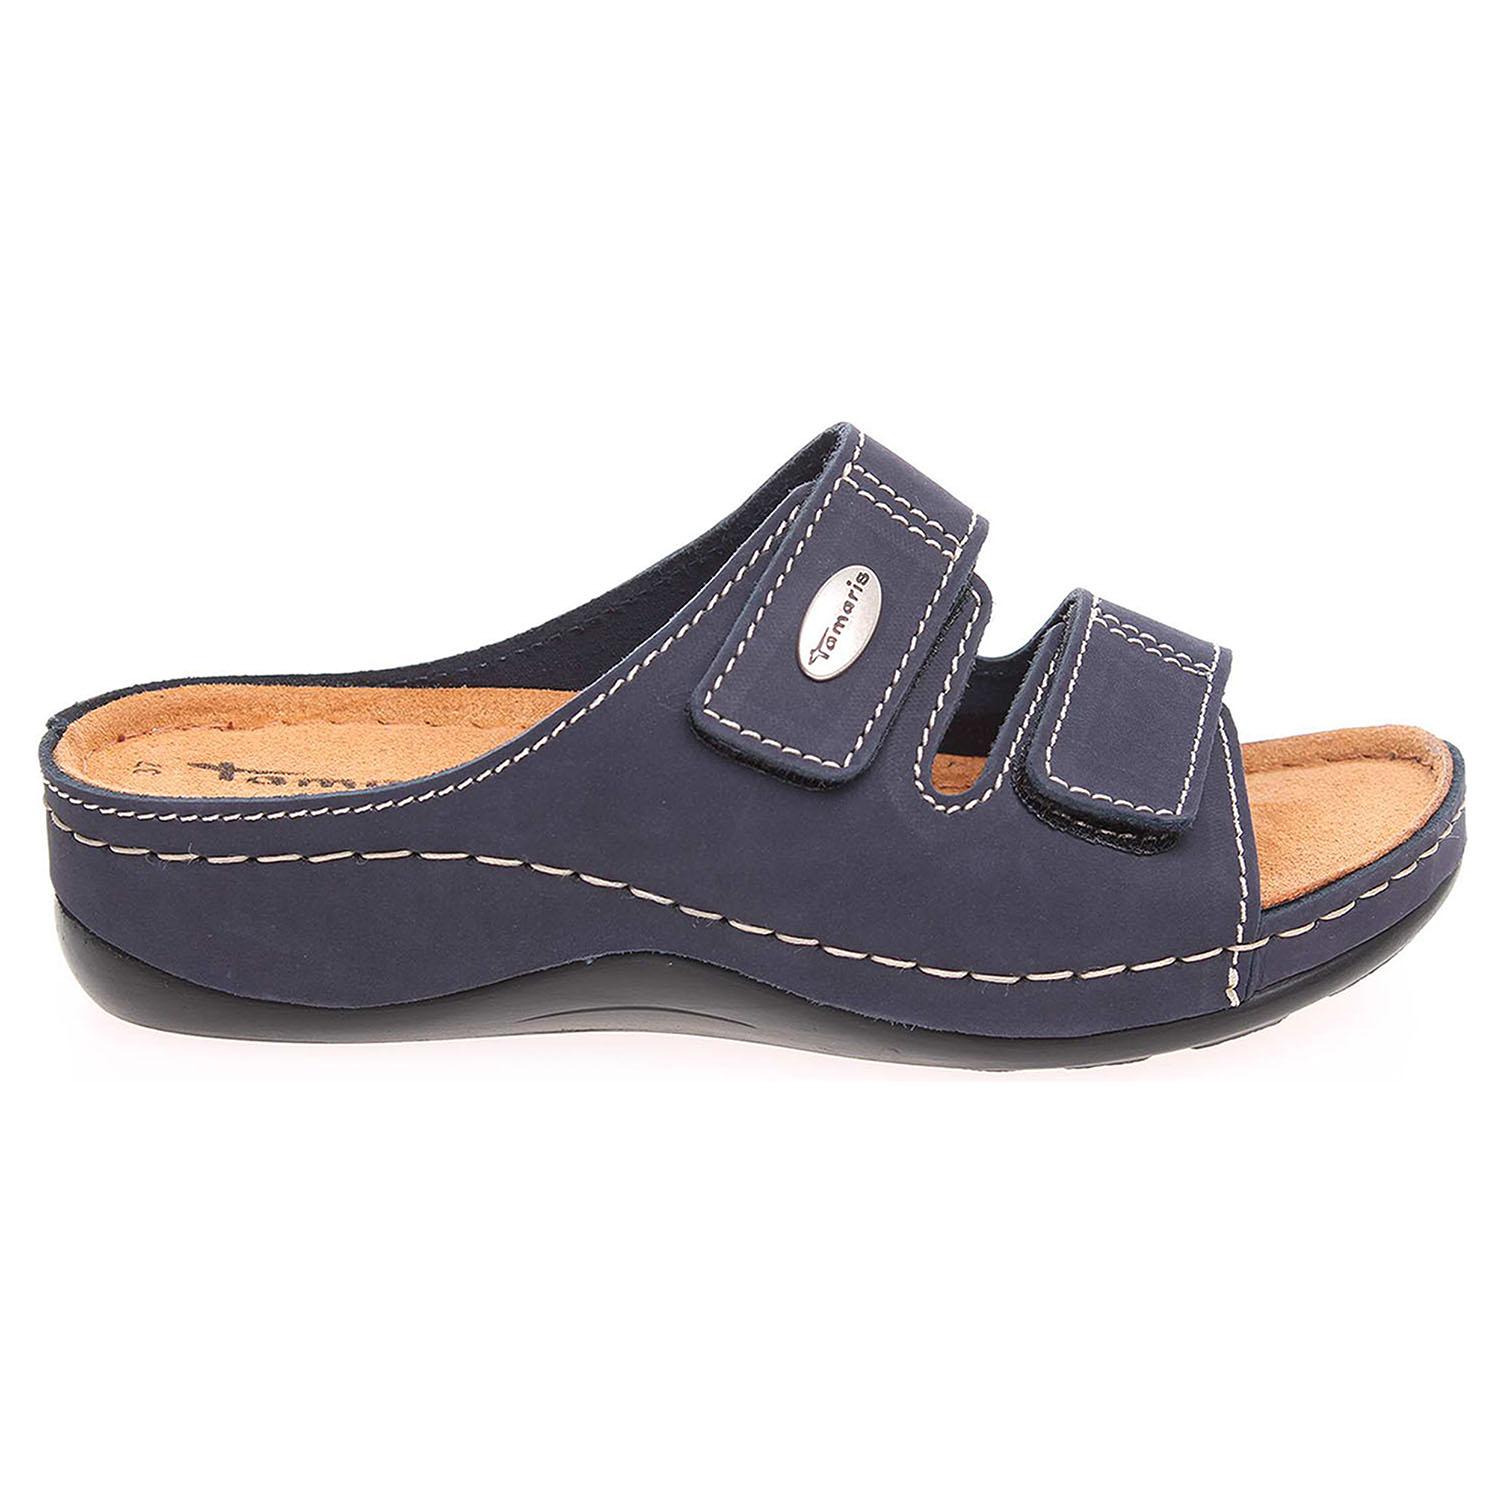 Ecco Tamaris dámské pantofle 1-27510-28 modré 23400181